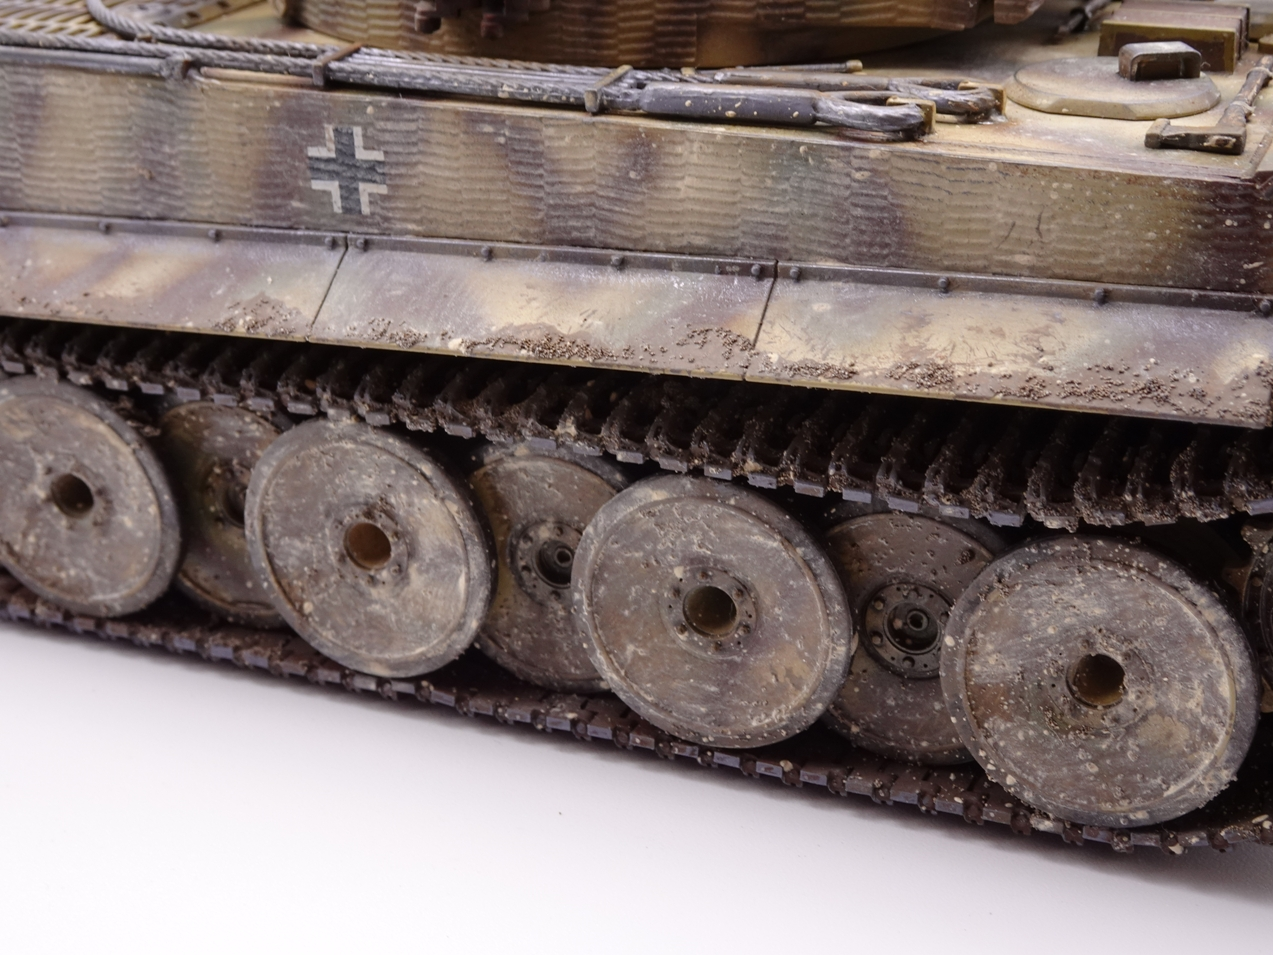 [Tamiya 1/35]  Tiger I mid production réf. 35194 Tigremid-fin-14